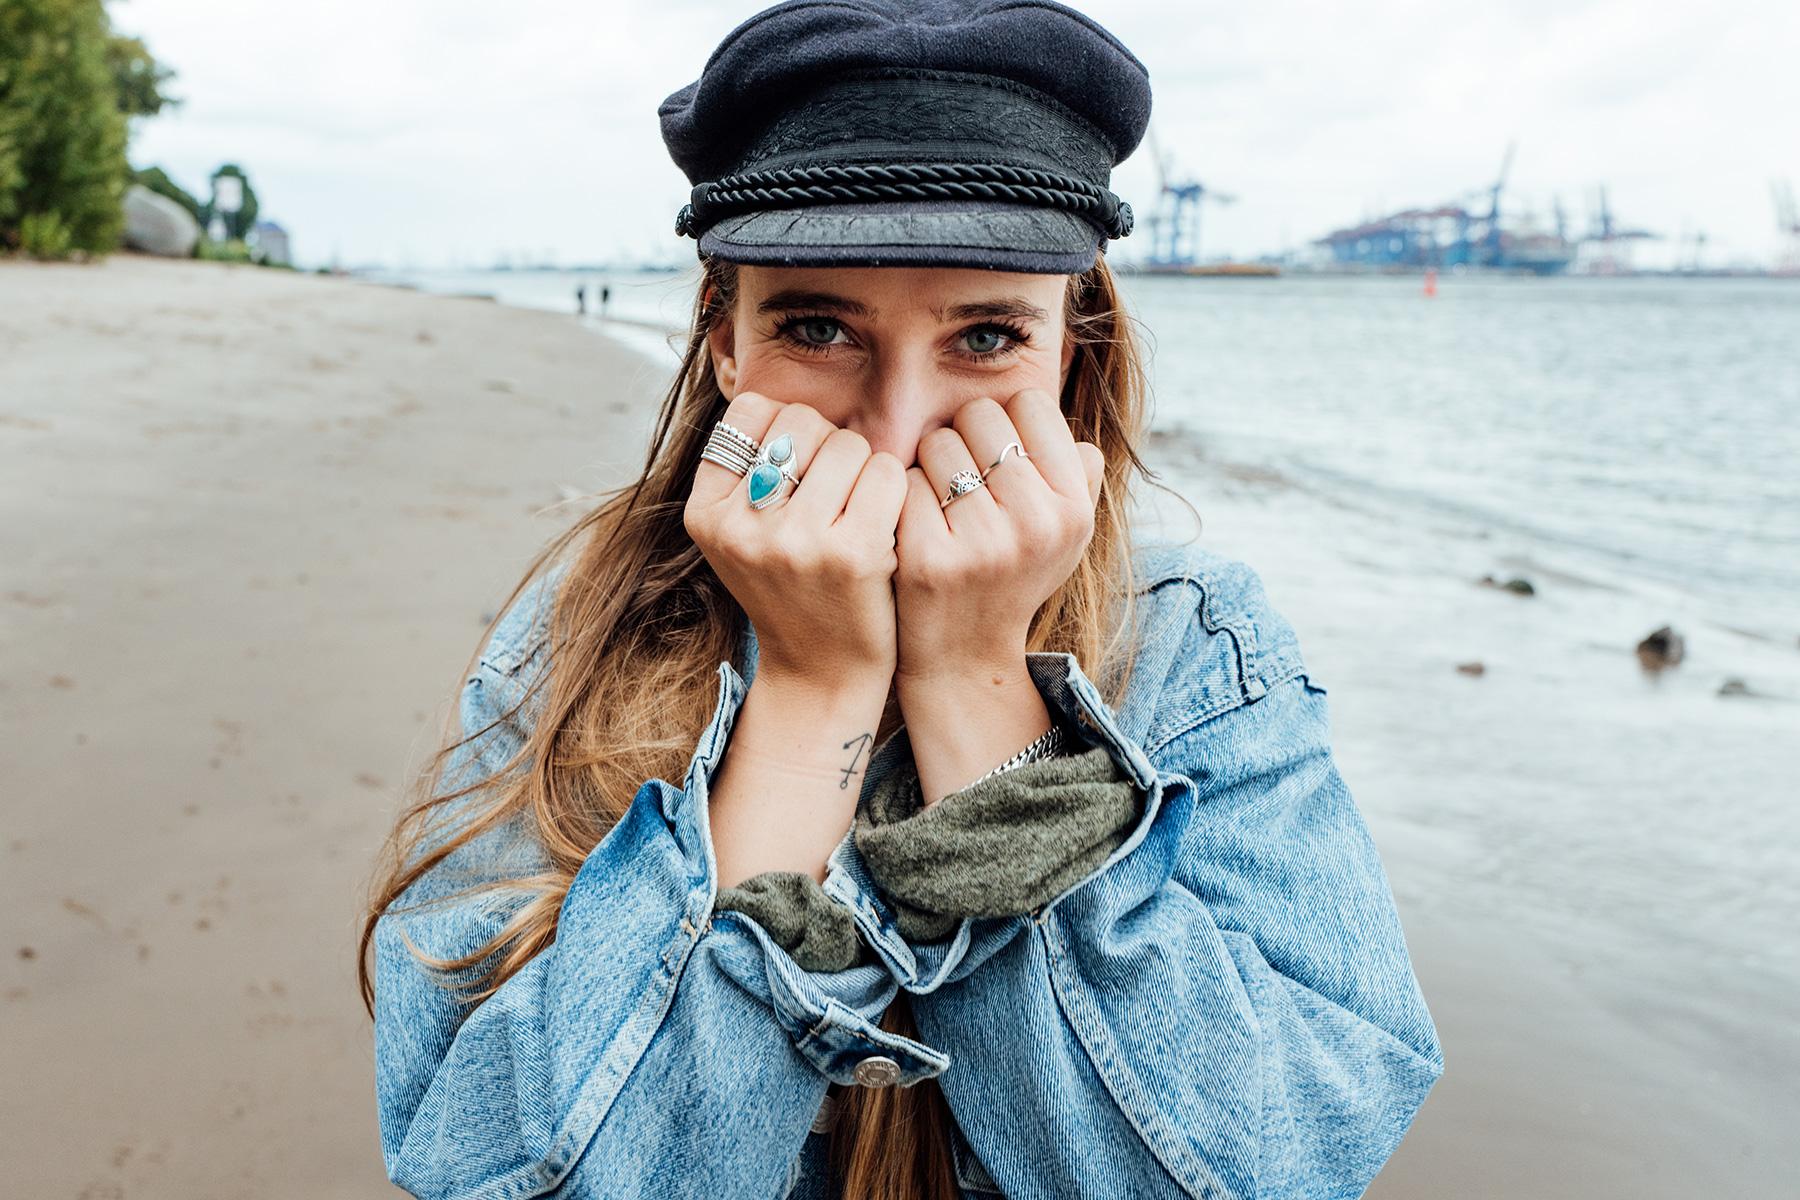 Geheimtipp Hamburg Produkt Travel Tales Jewelry Dahlina Sophie Kock 012